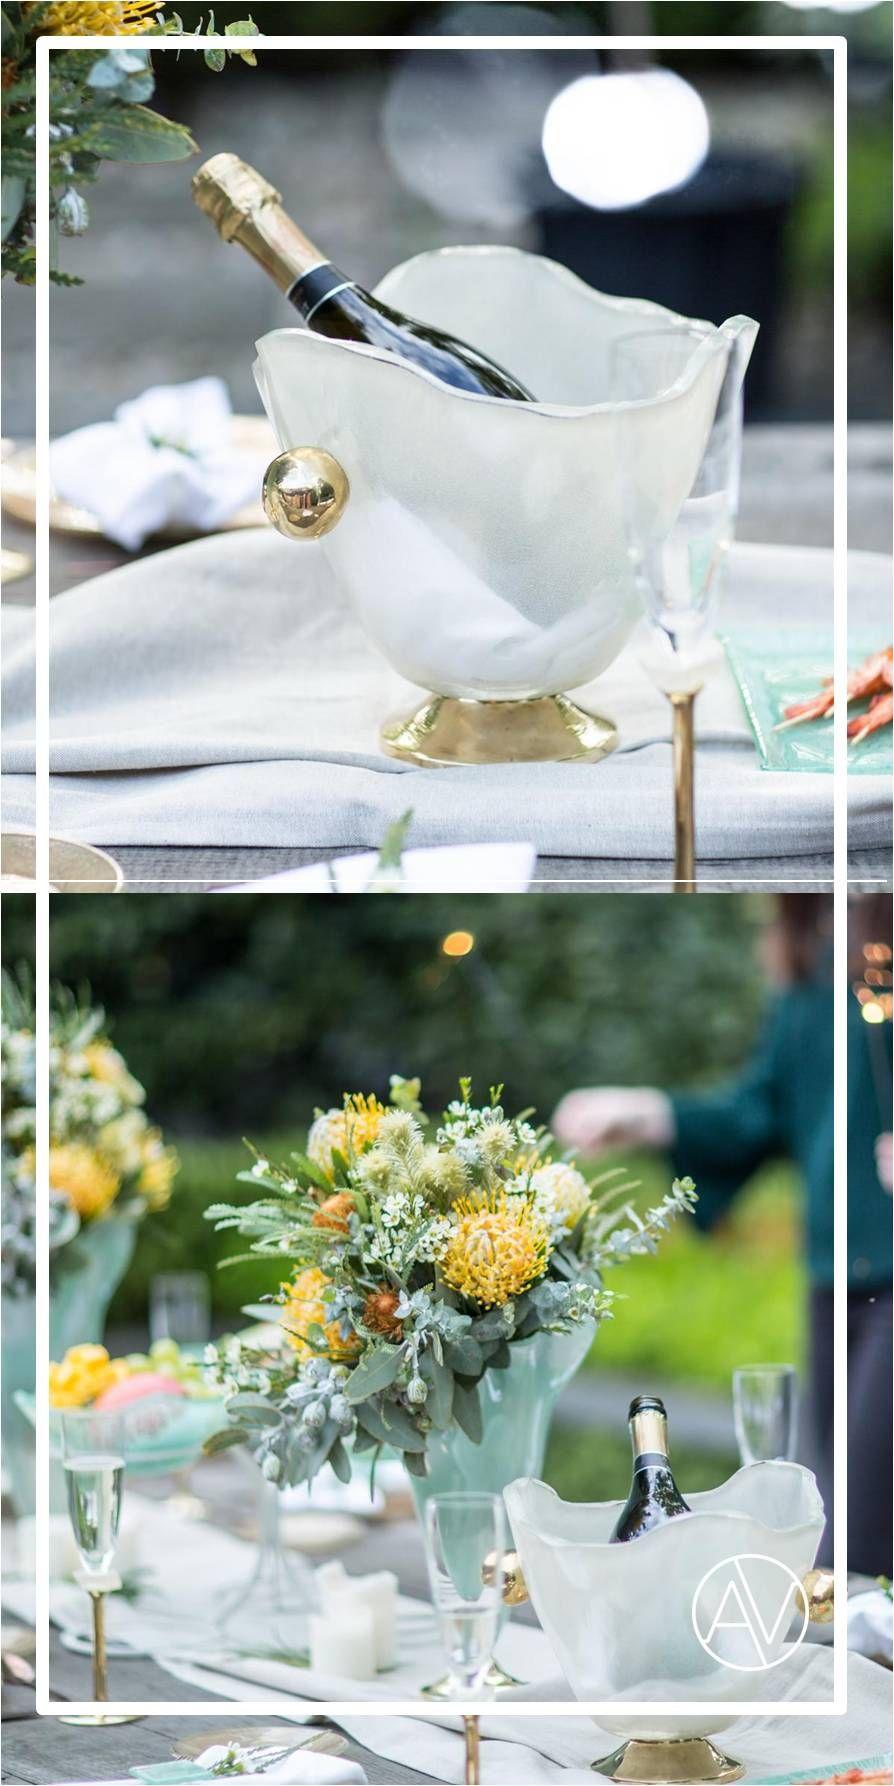 AnnaVasily Sharmi, Gold glass champagne ice bucket on